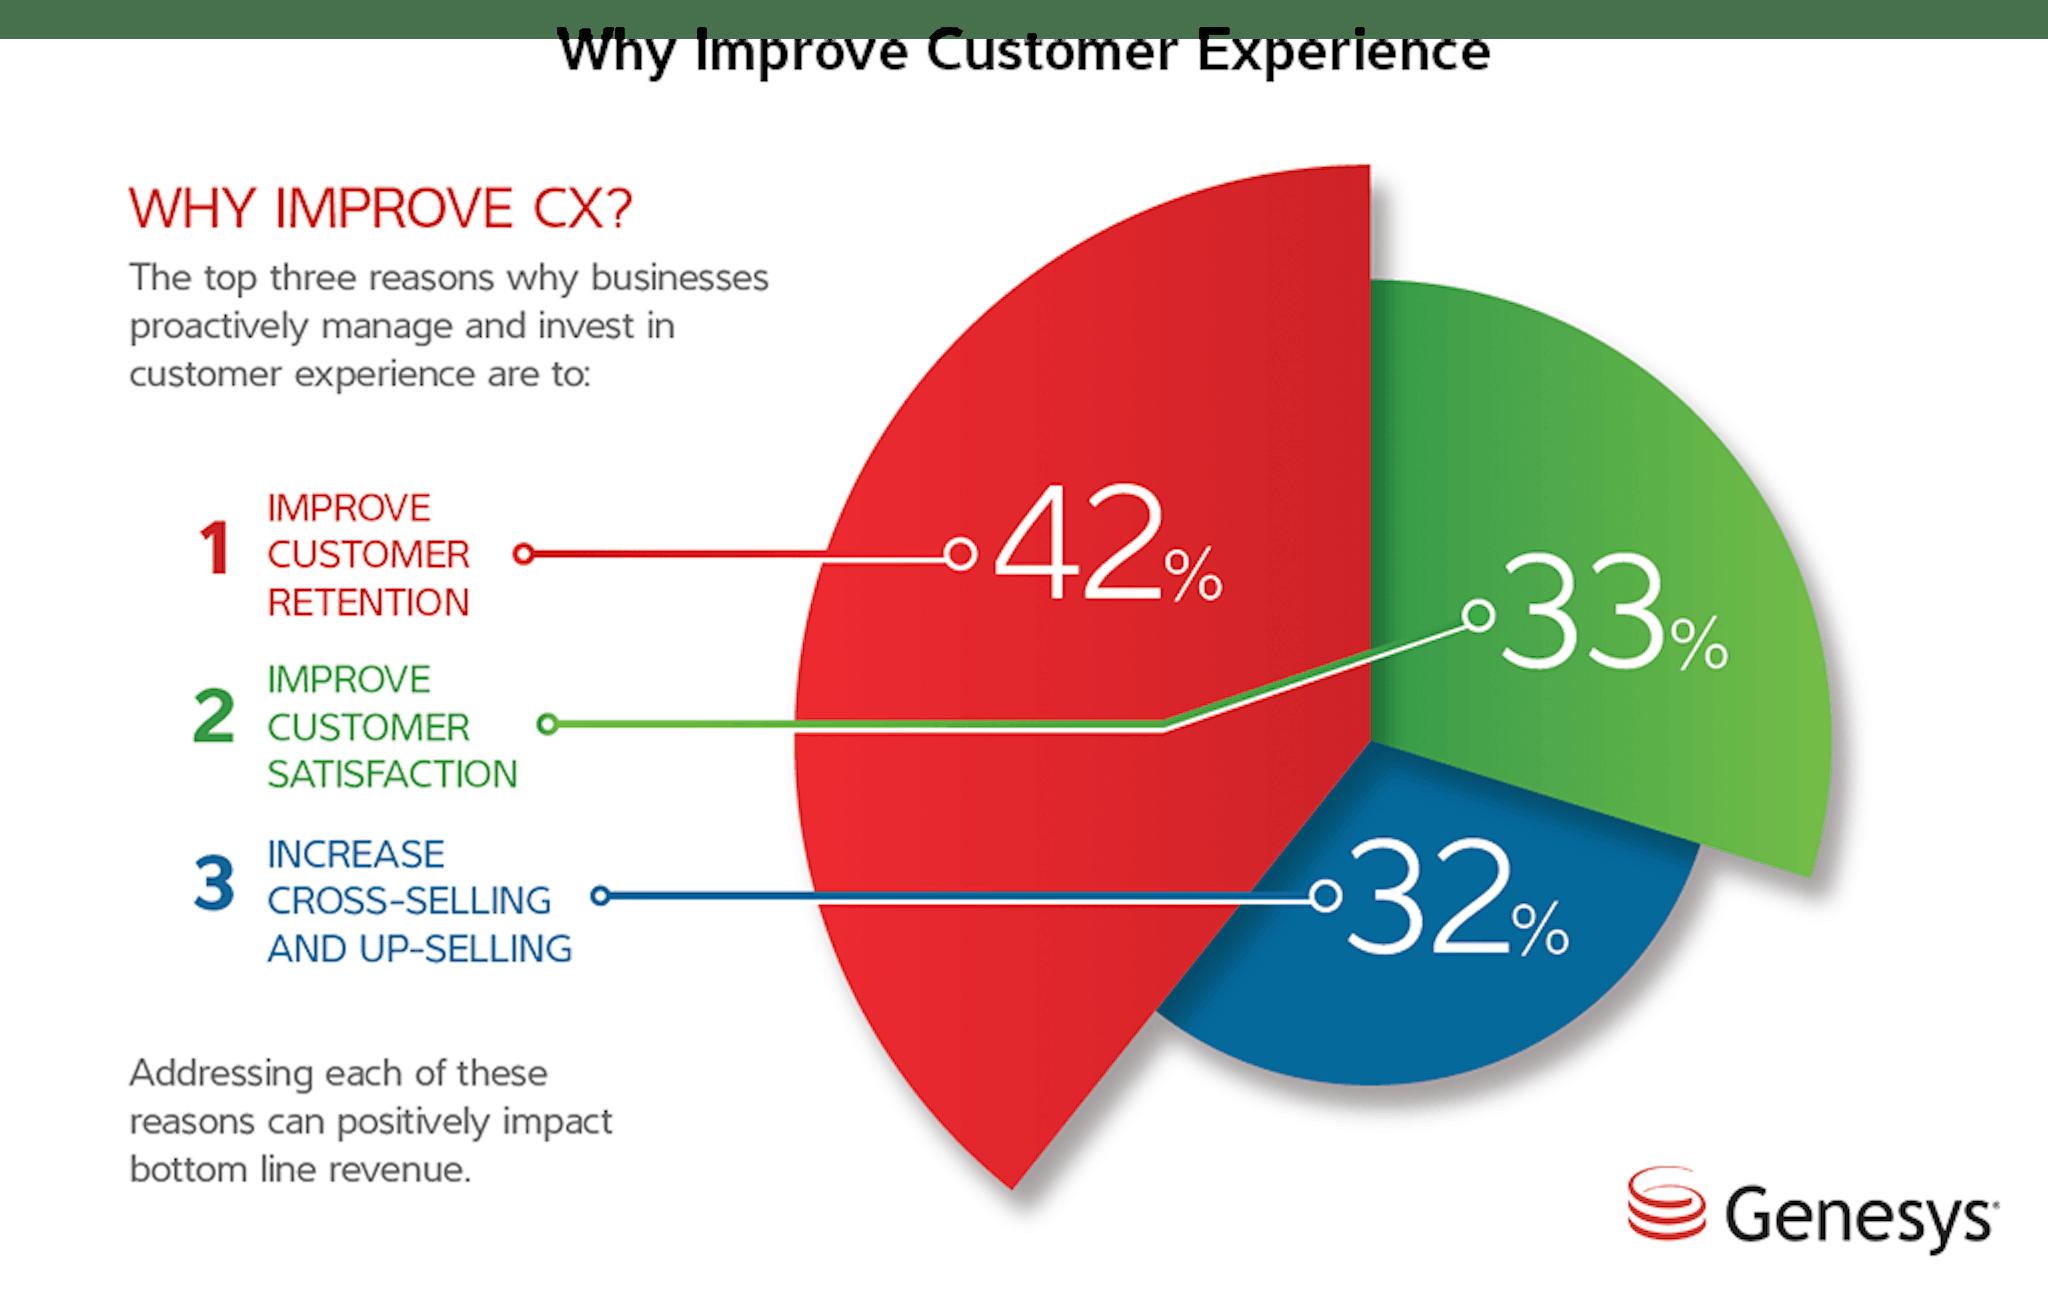 Why Improve CX?